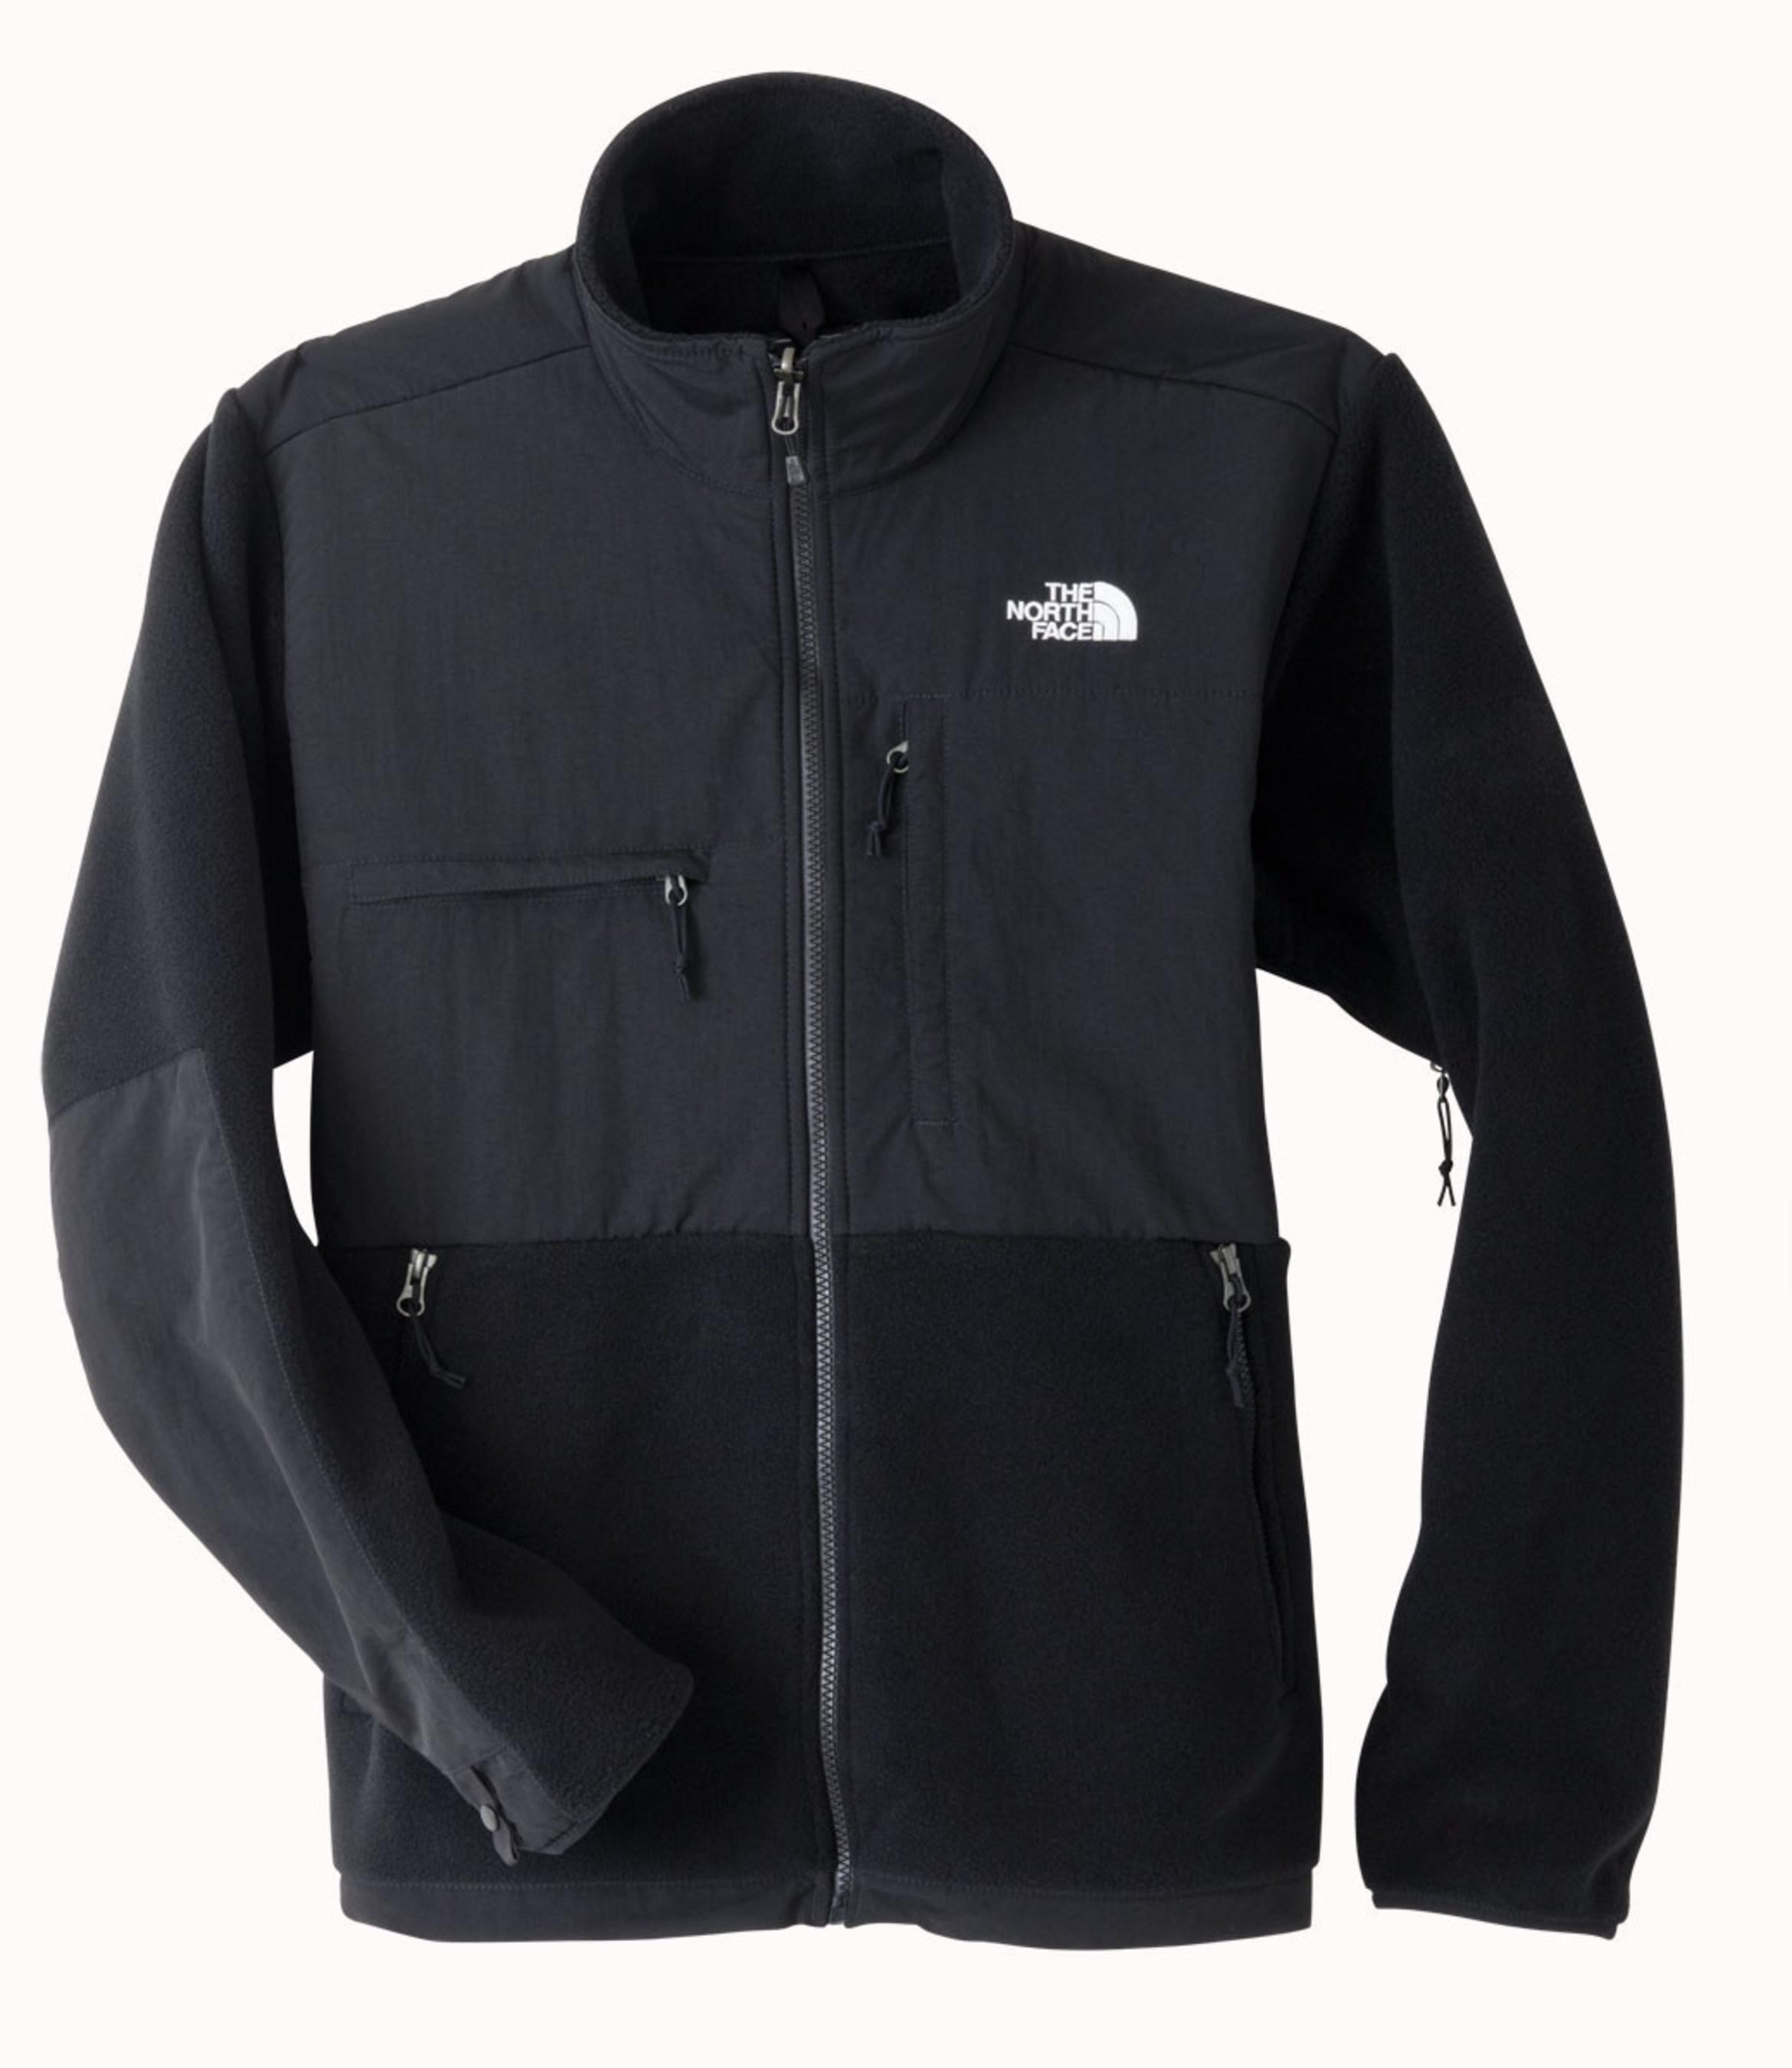 sale womens north face denali jacket cheap insurance 889dd